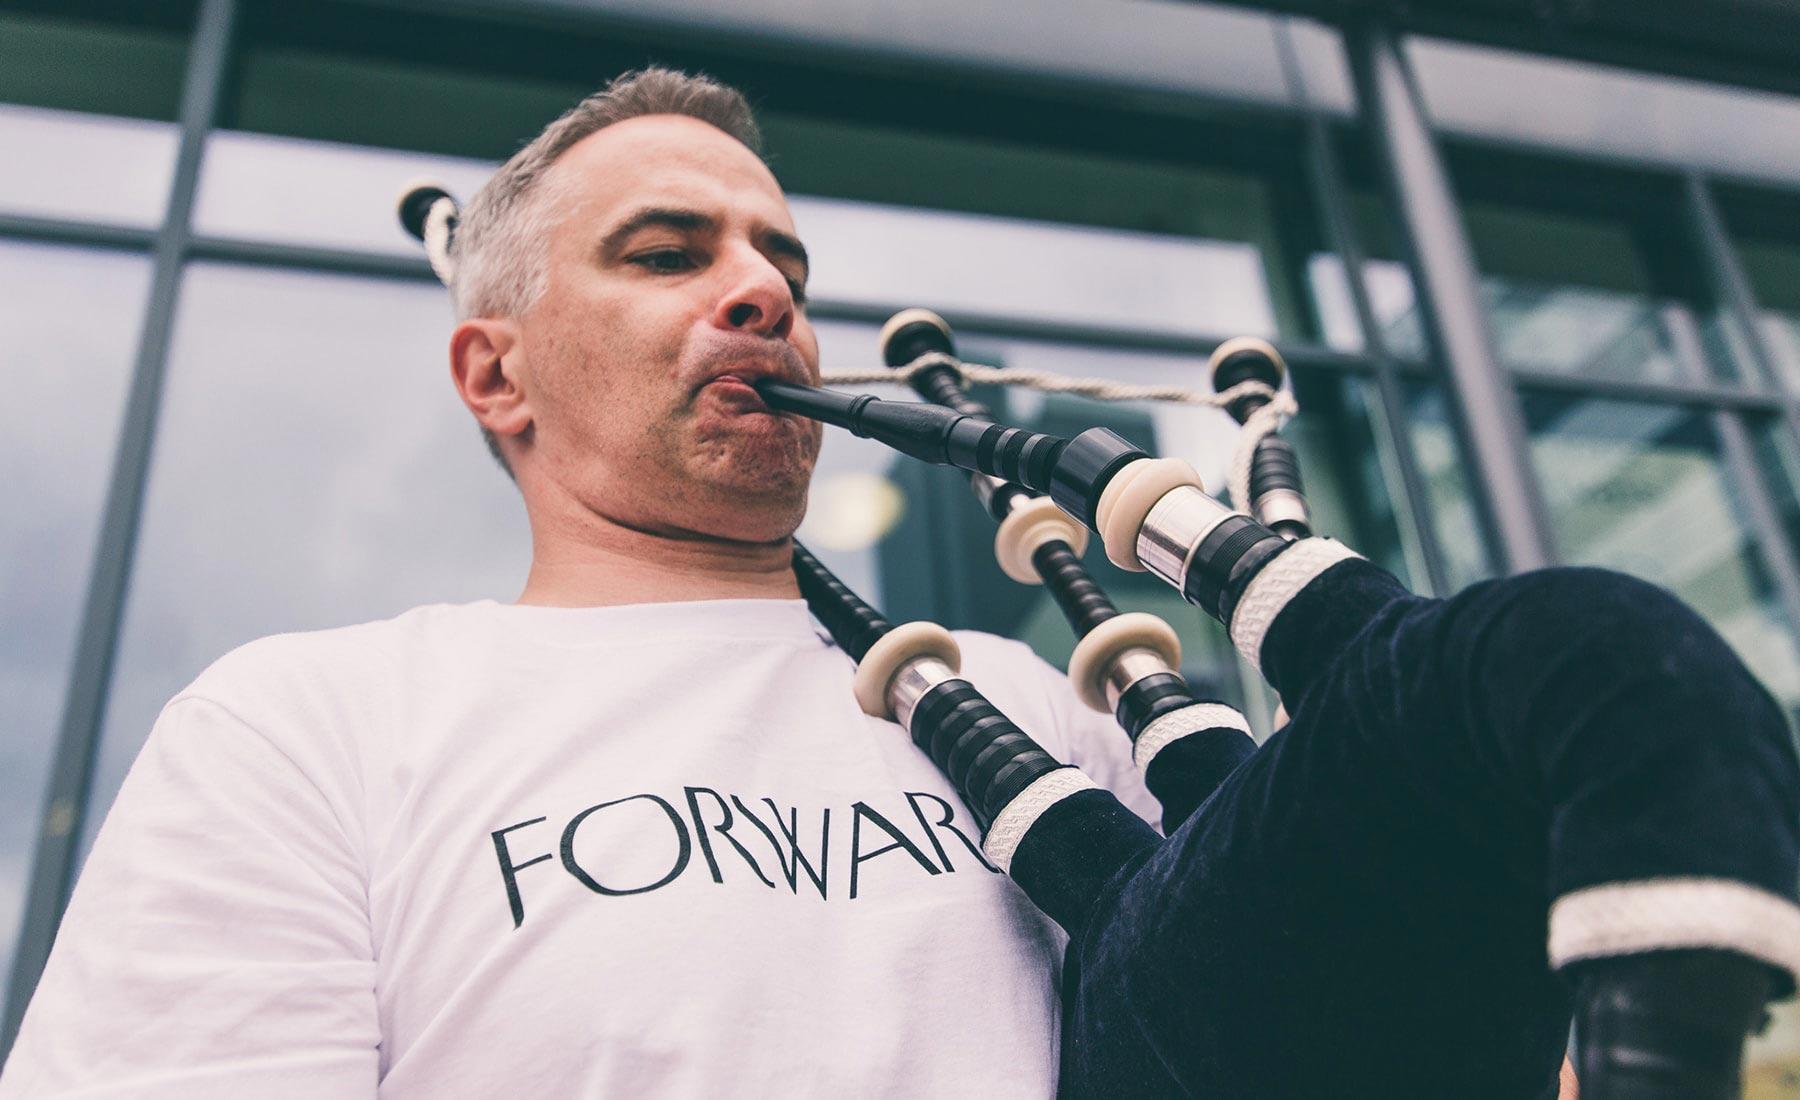 recap-forward-festival-hamburg-2018-bagpiper